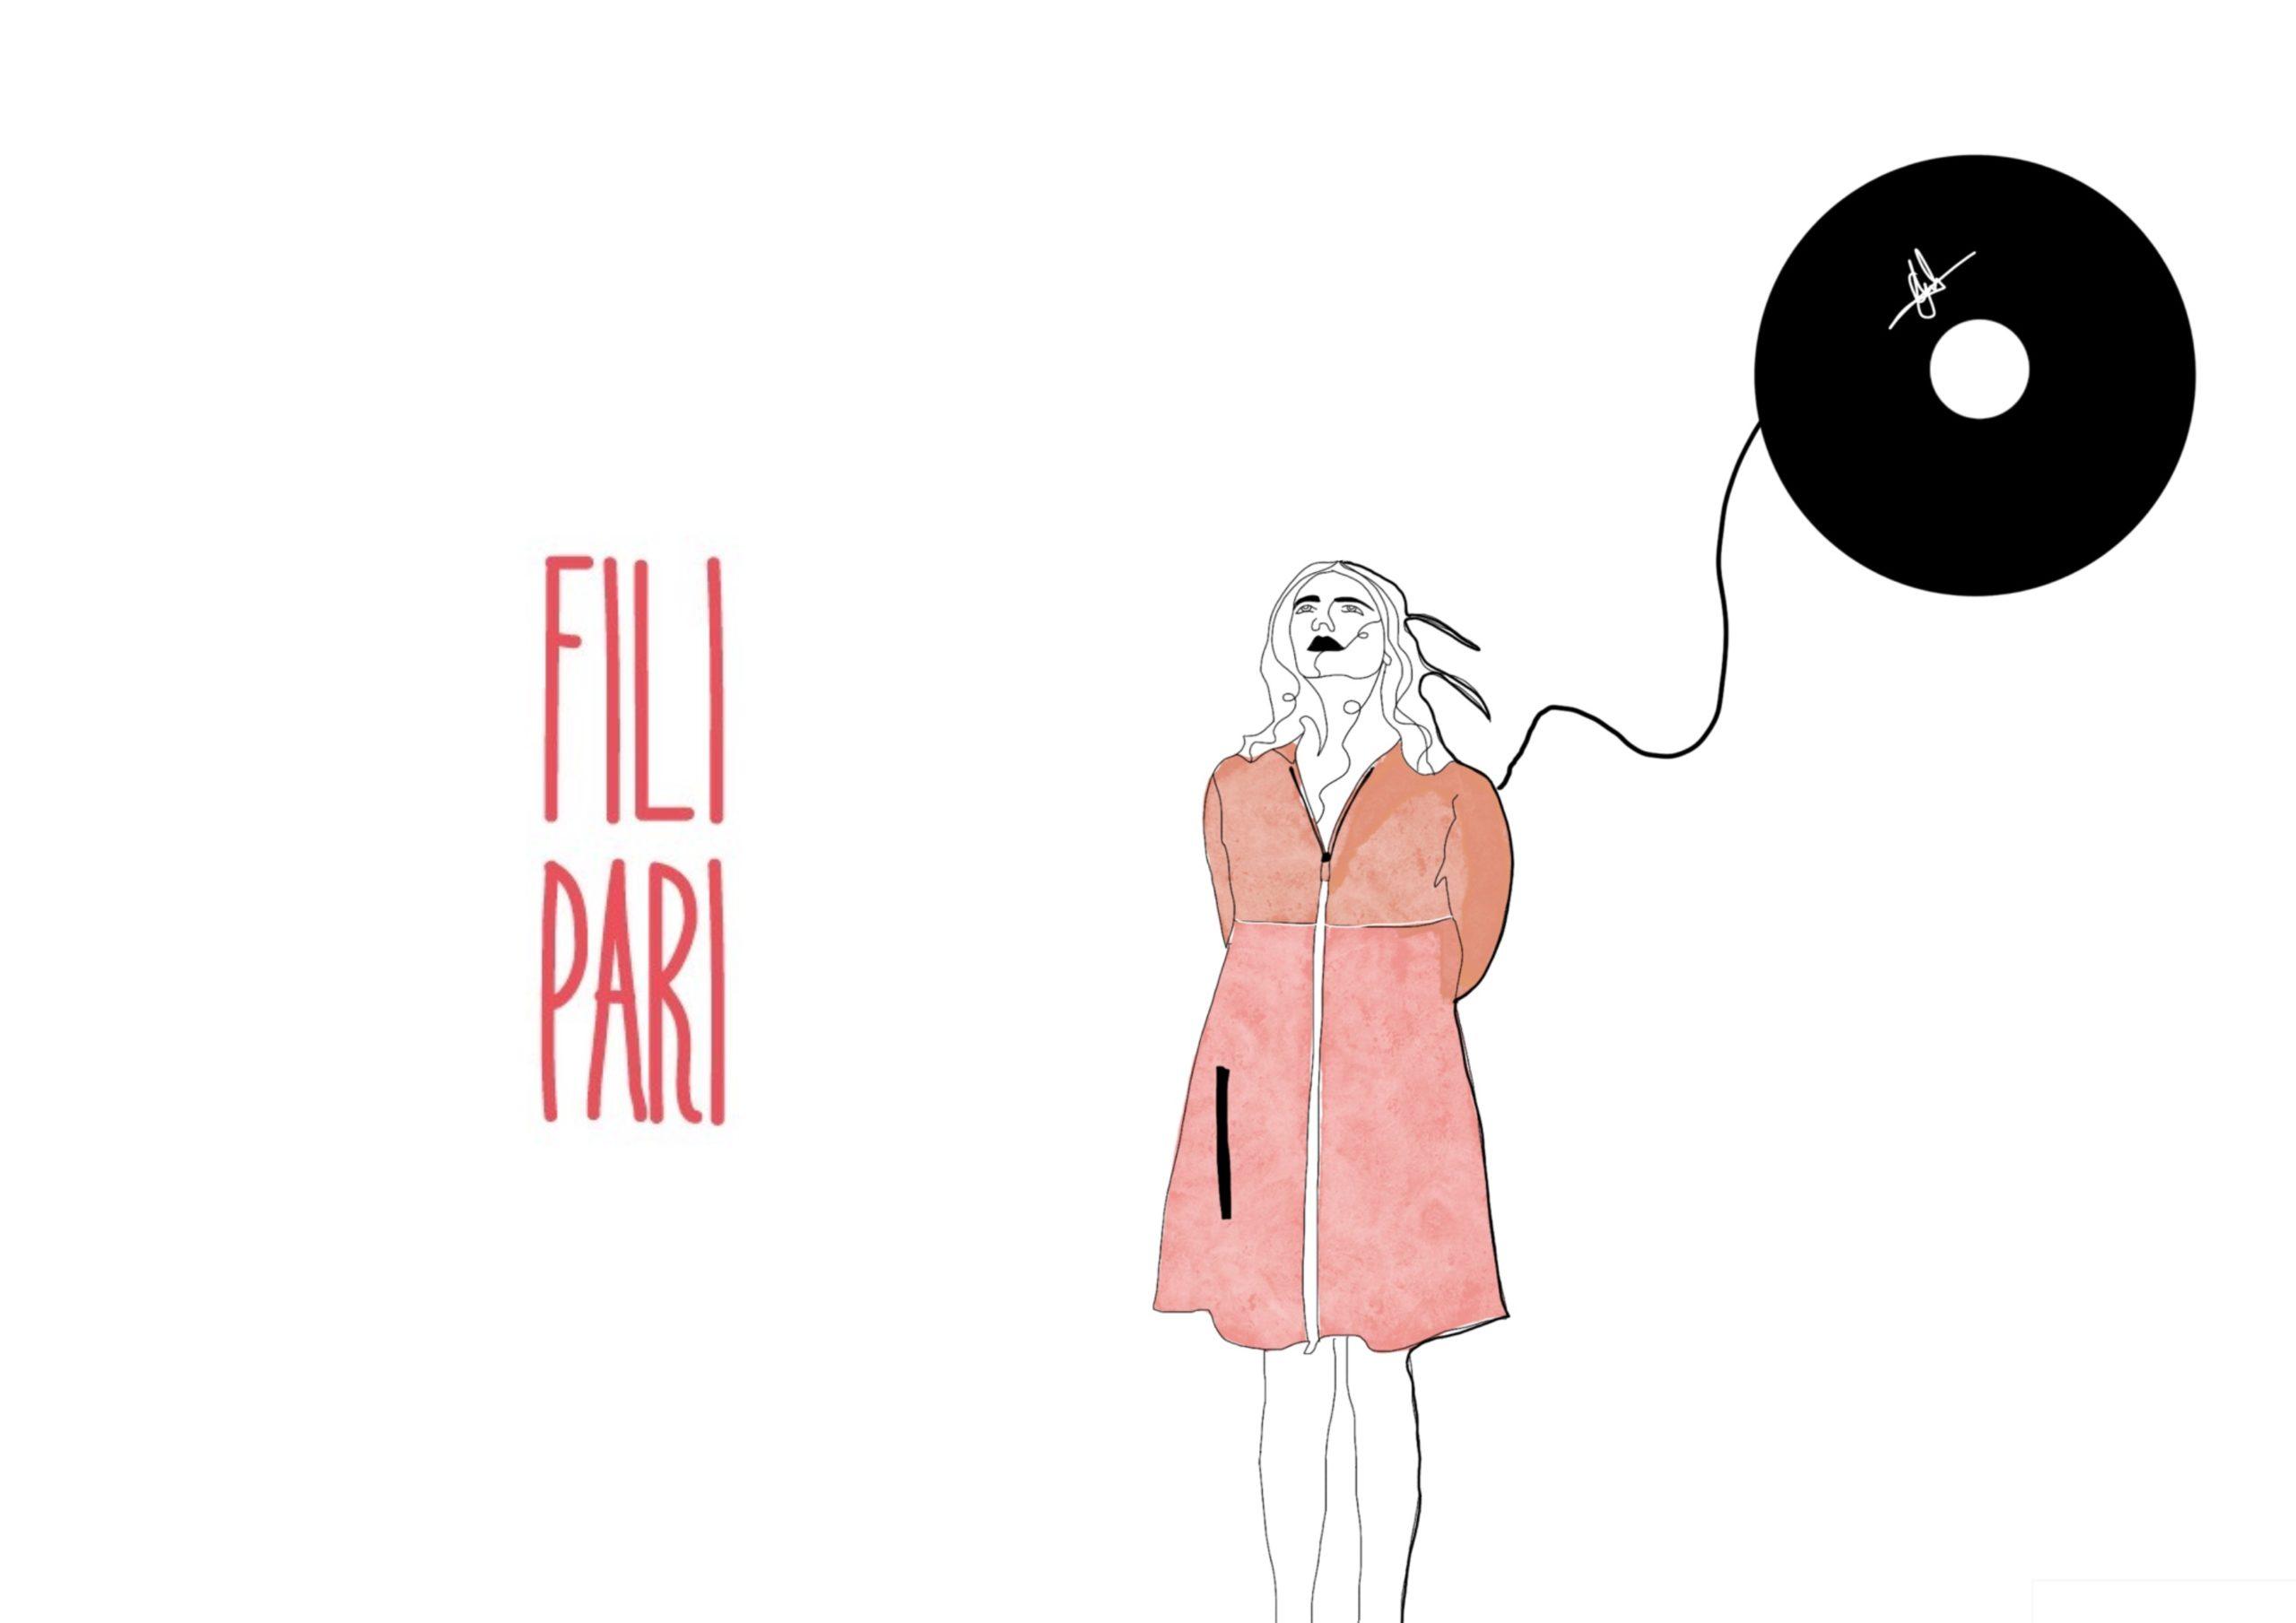 FILI PARI Illustrated by Gabriele Melodia